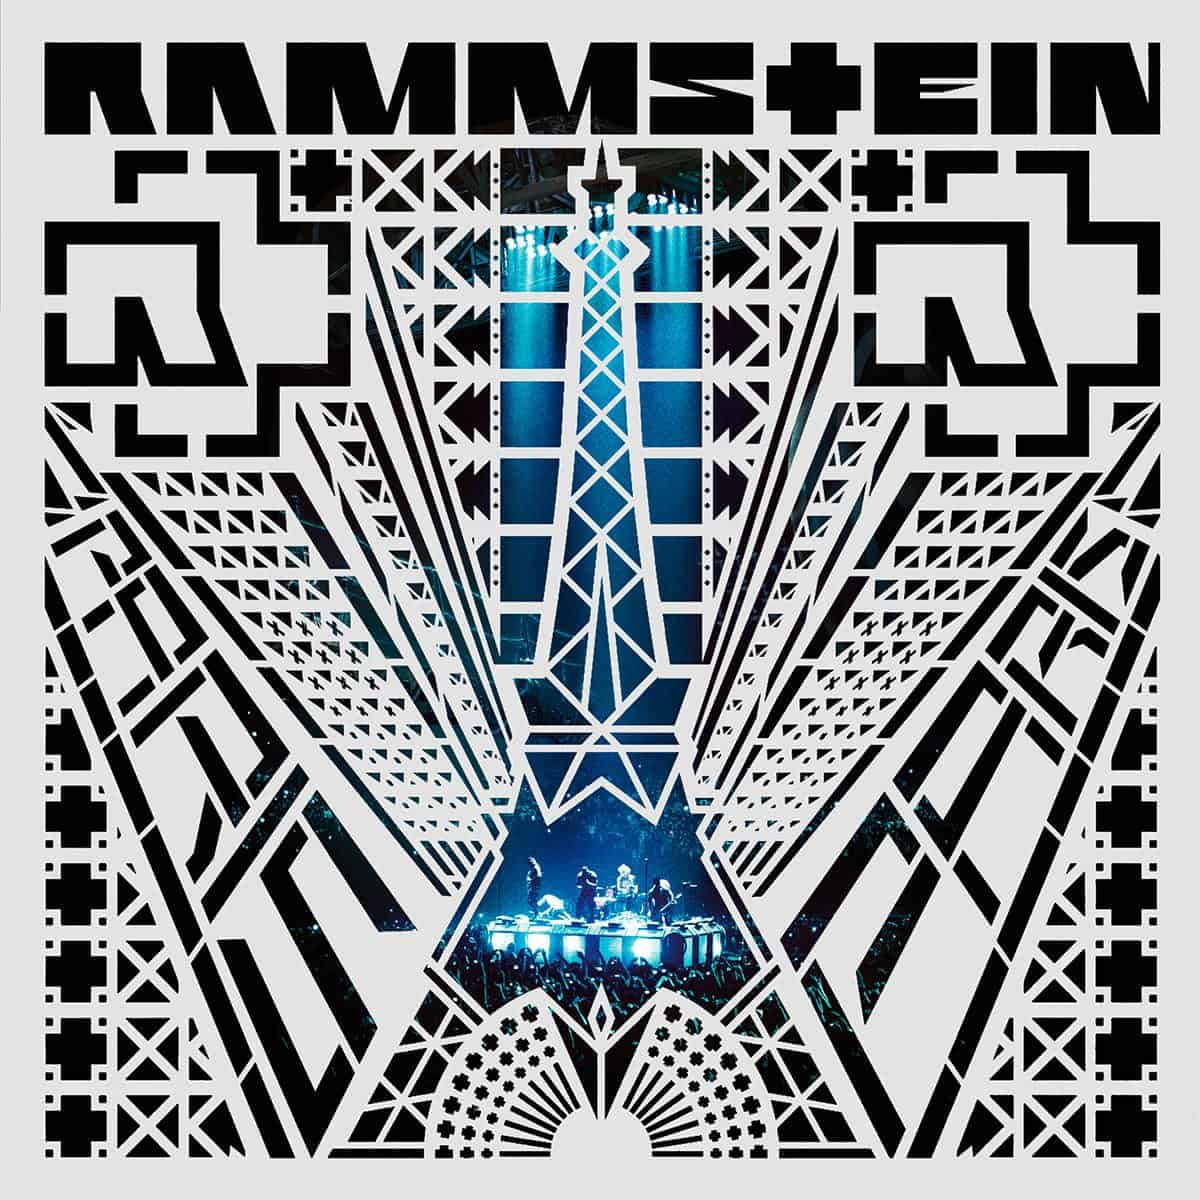 Album Review: Rammstein - Paris (Live) (Universal) - Games